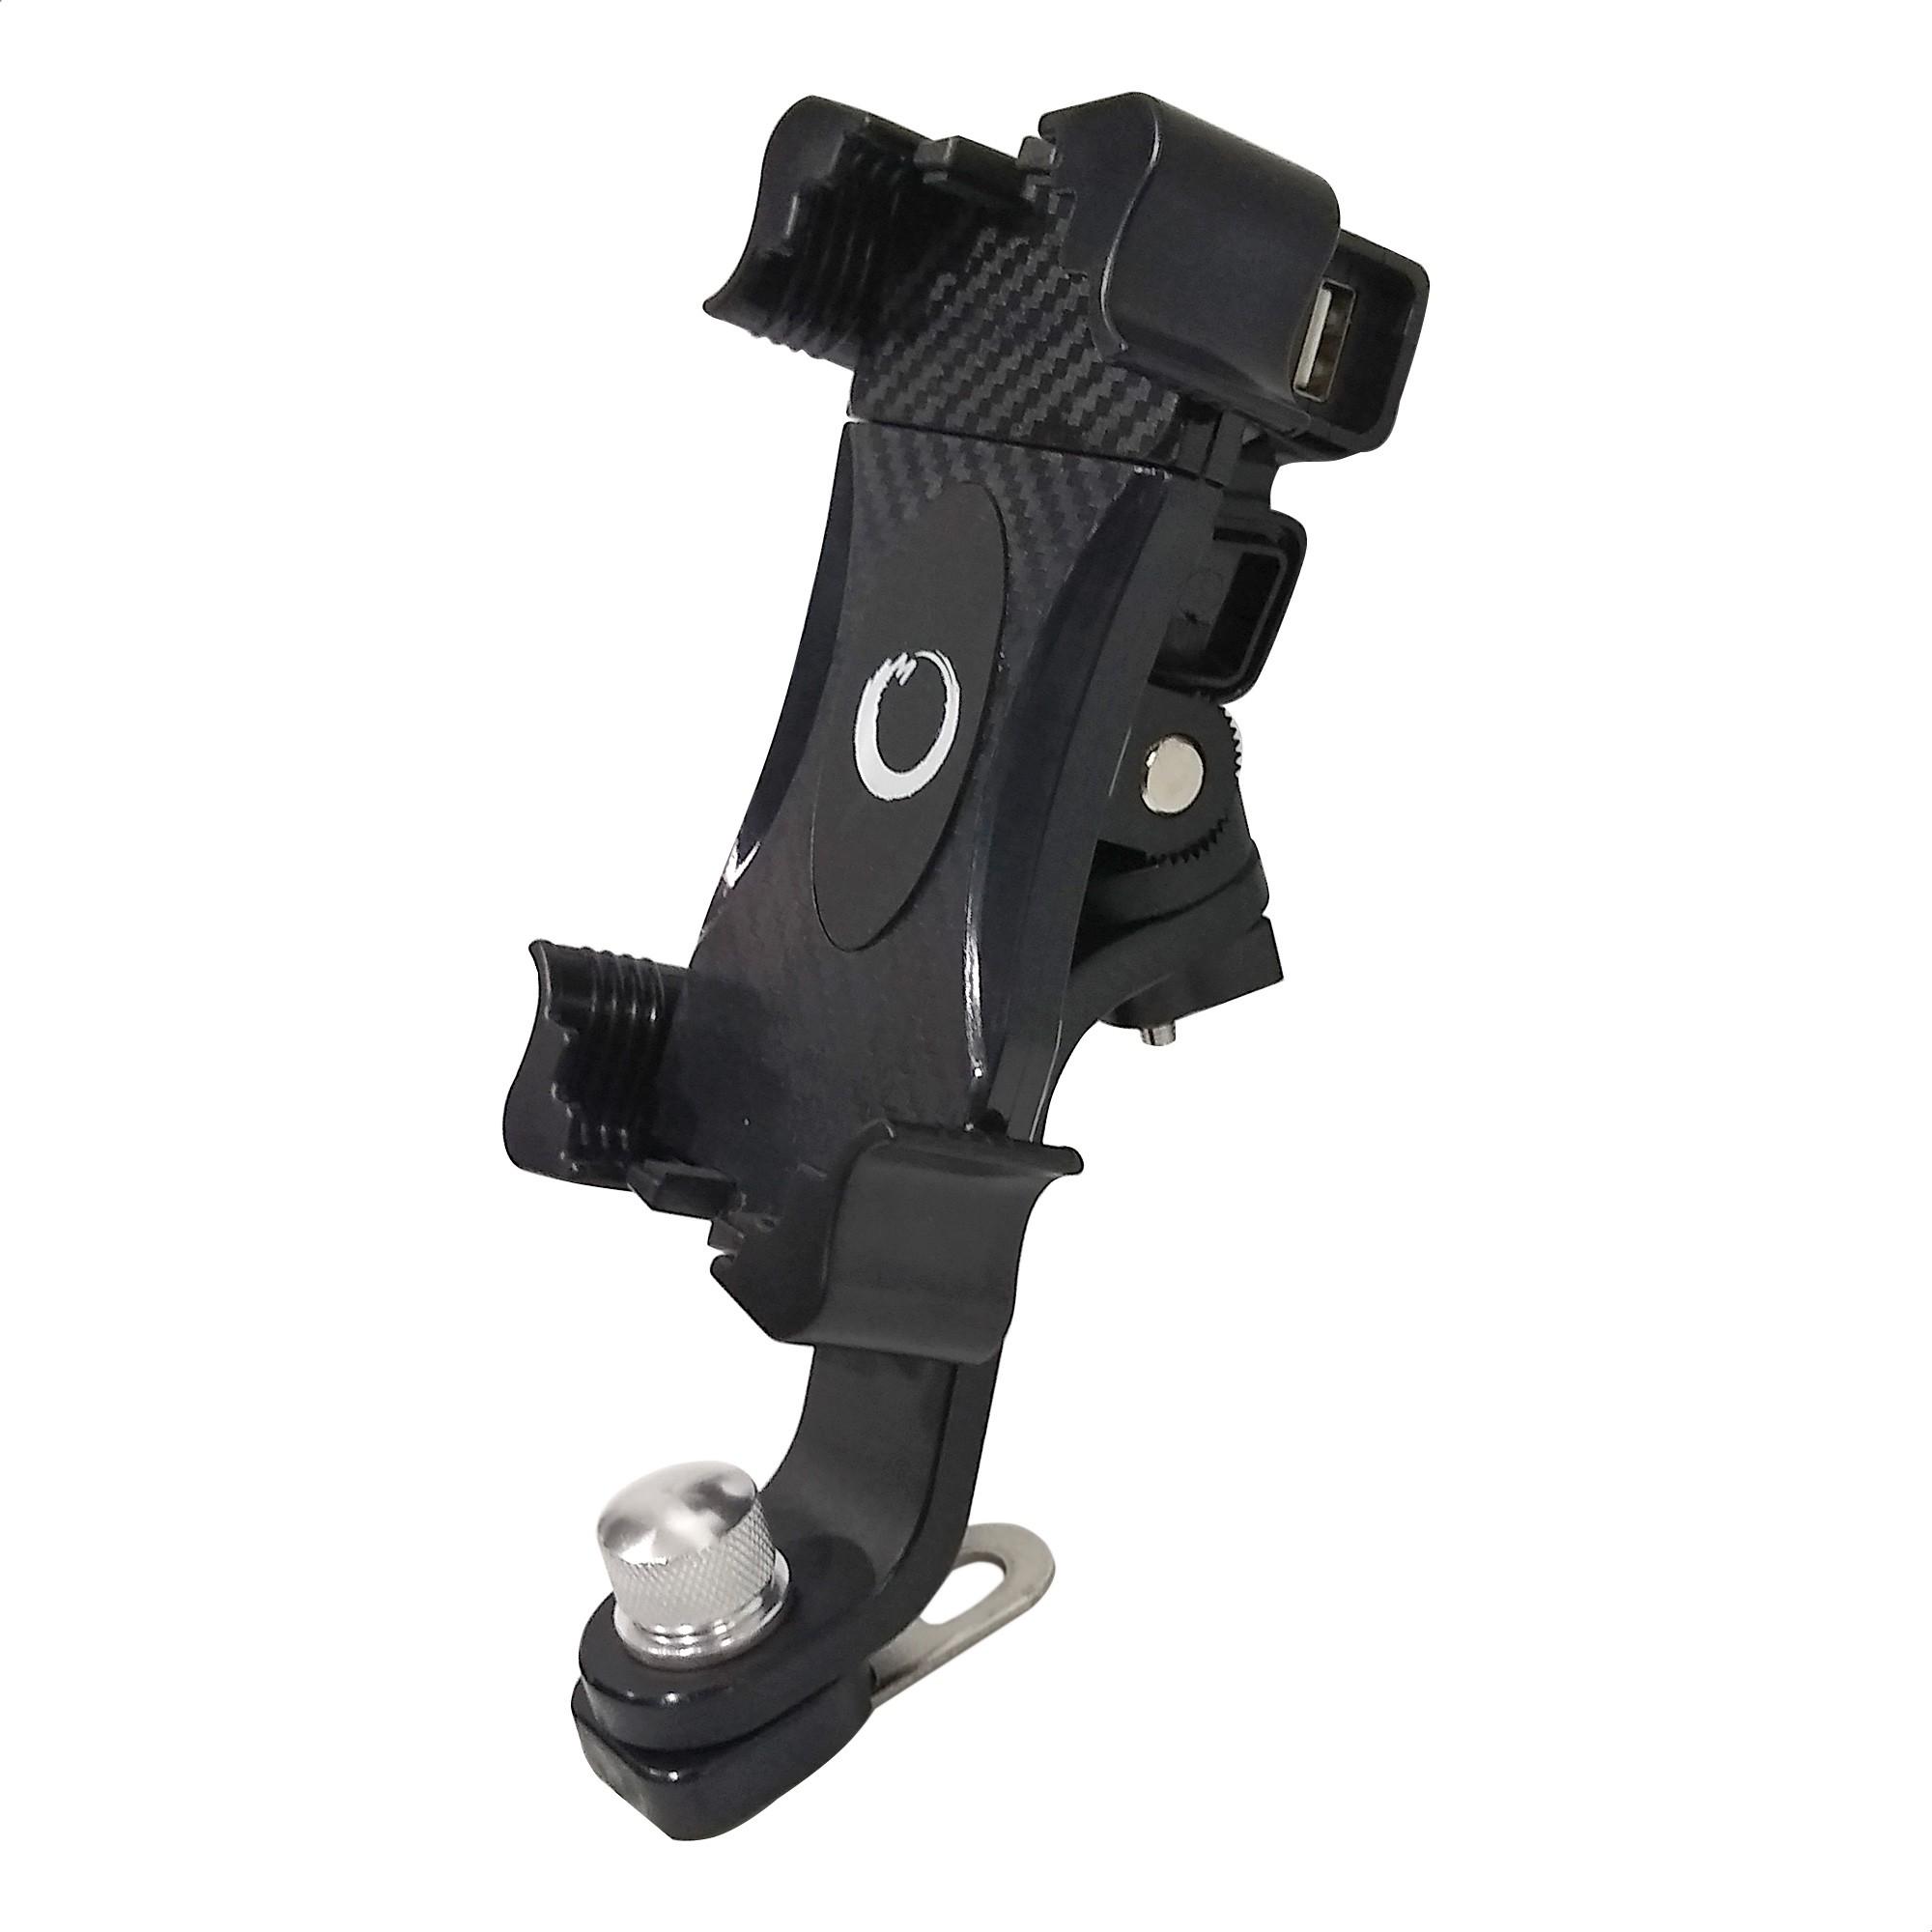 Soporte Celular / GPS Cargador USB Samurai Warrior YF8-1